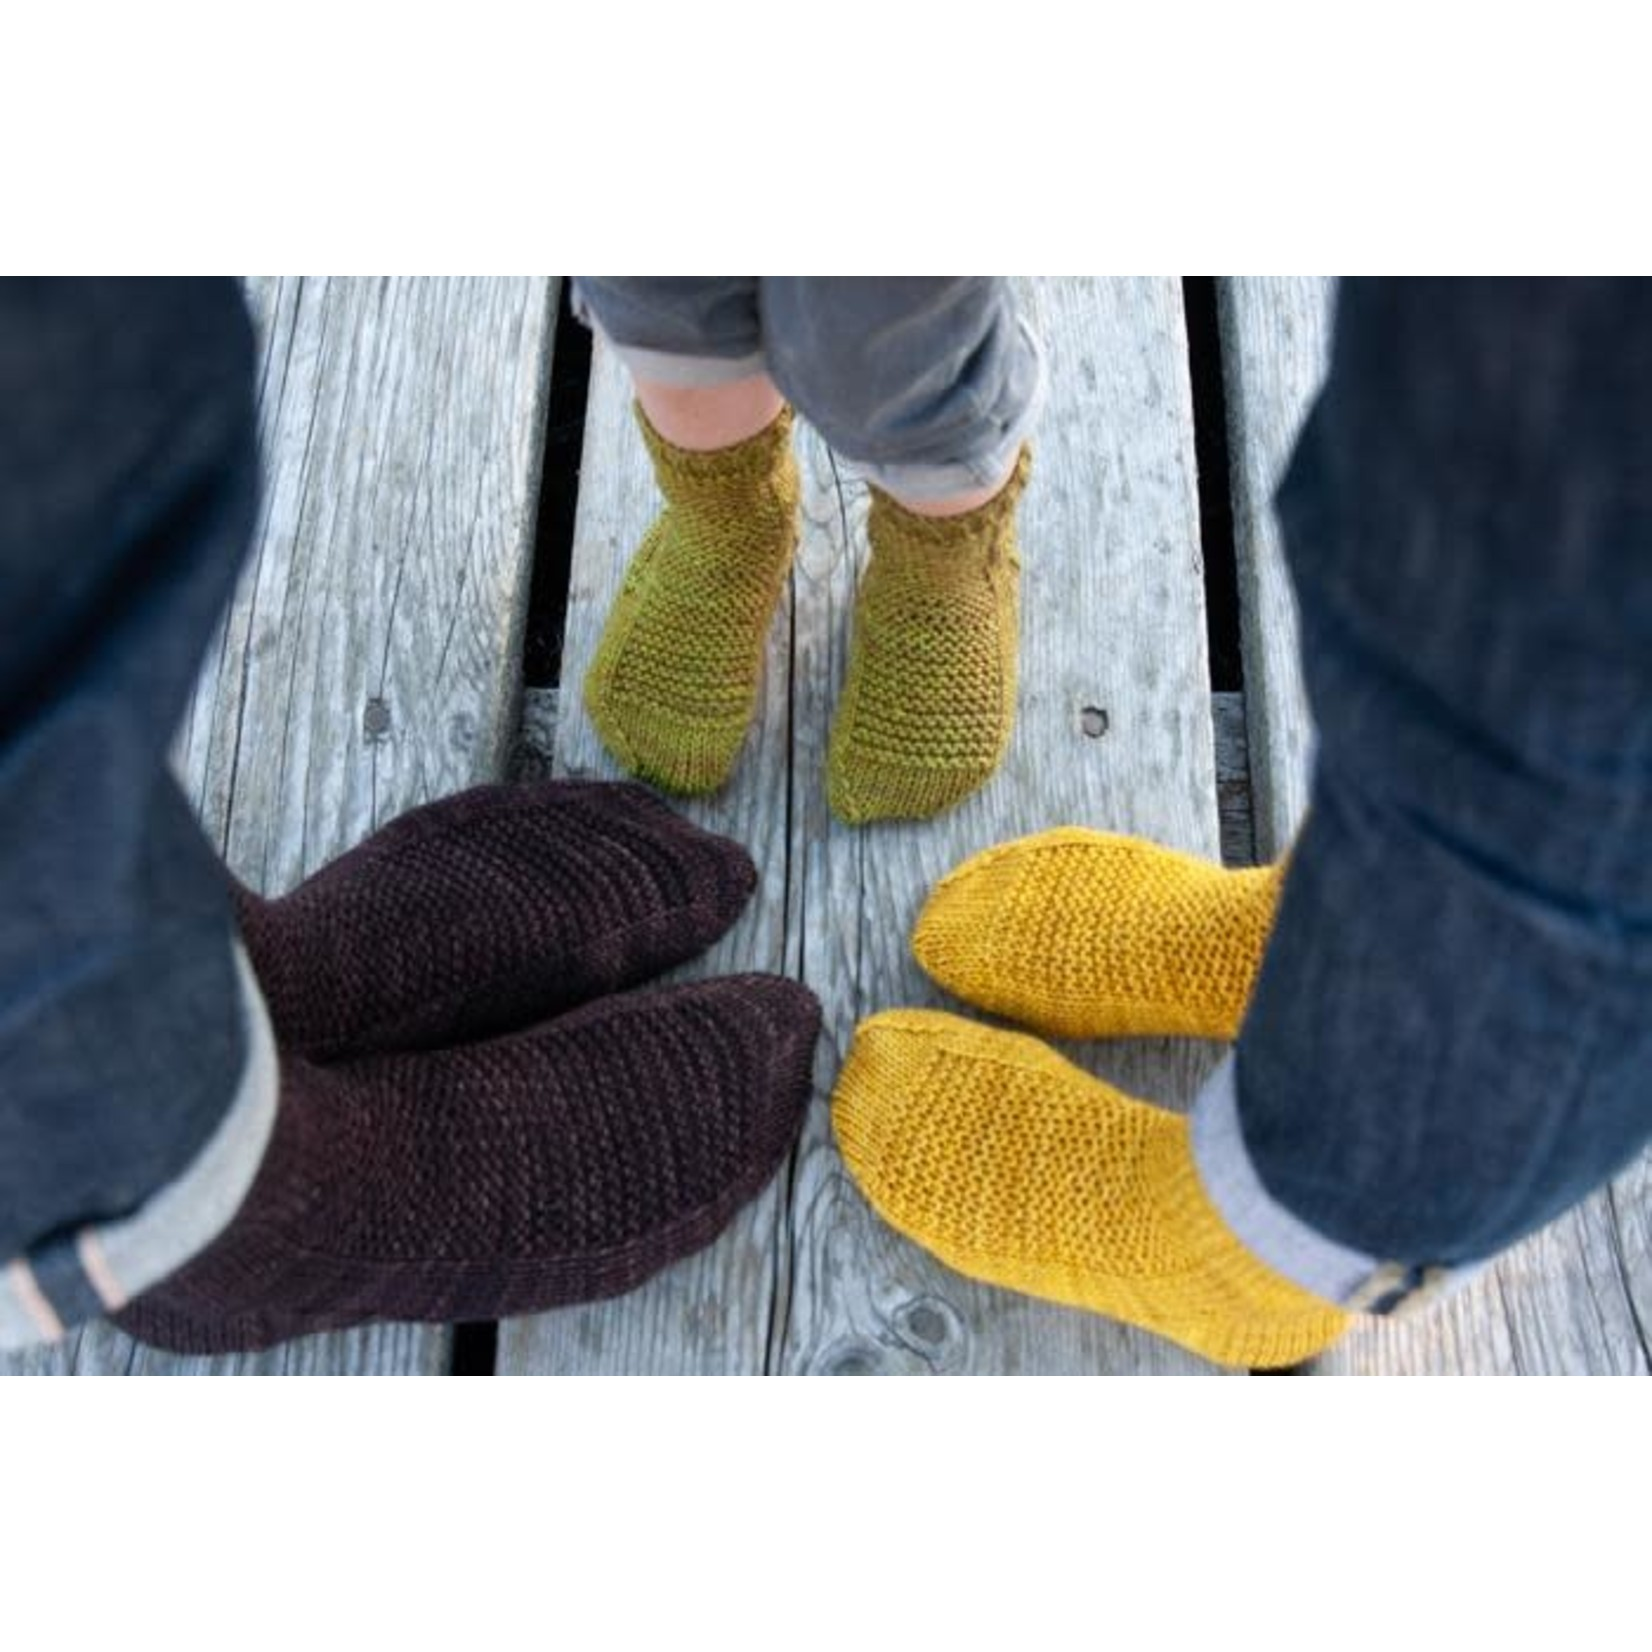 Yarn Twisters Socks: Cuff Down